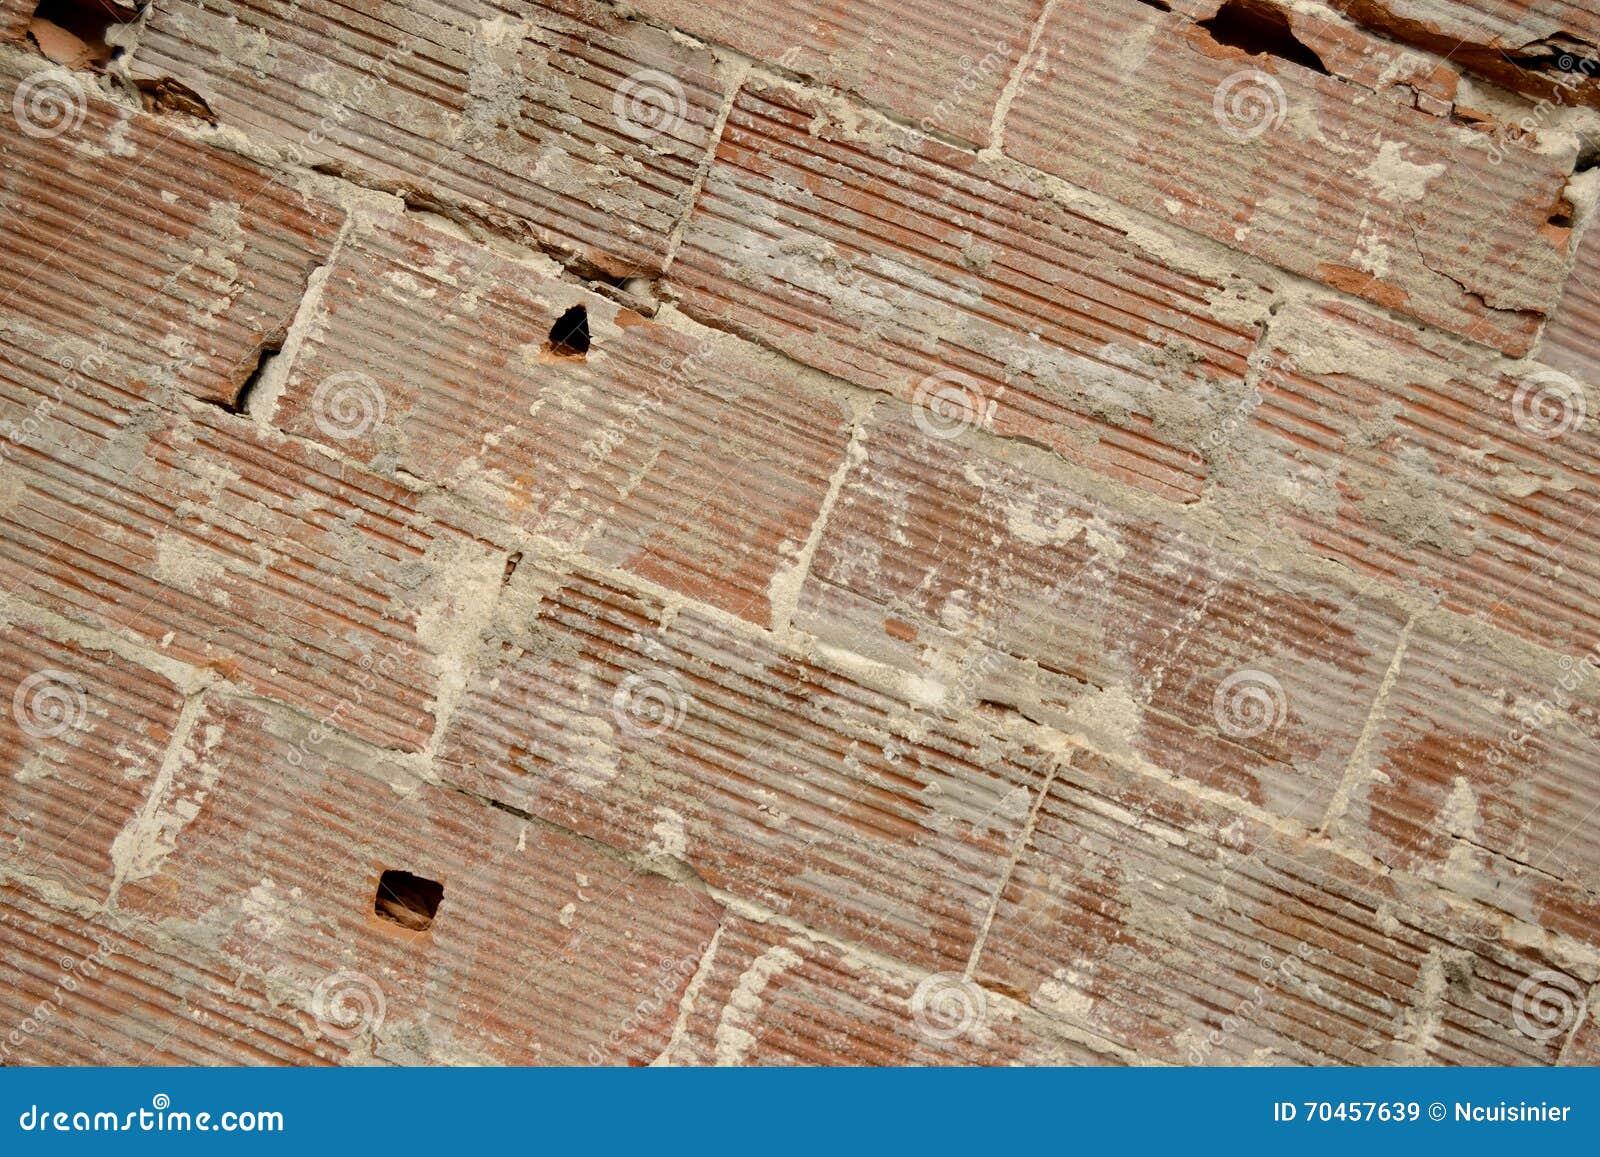 Big bricks old wall background, diagonal lines